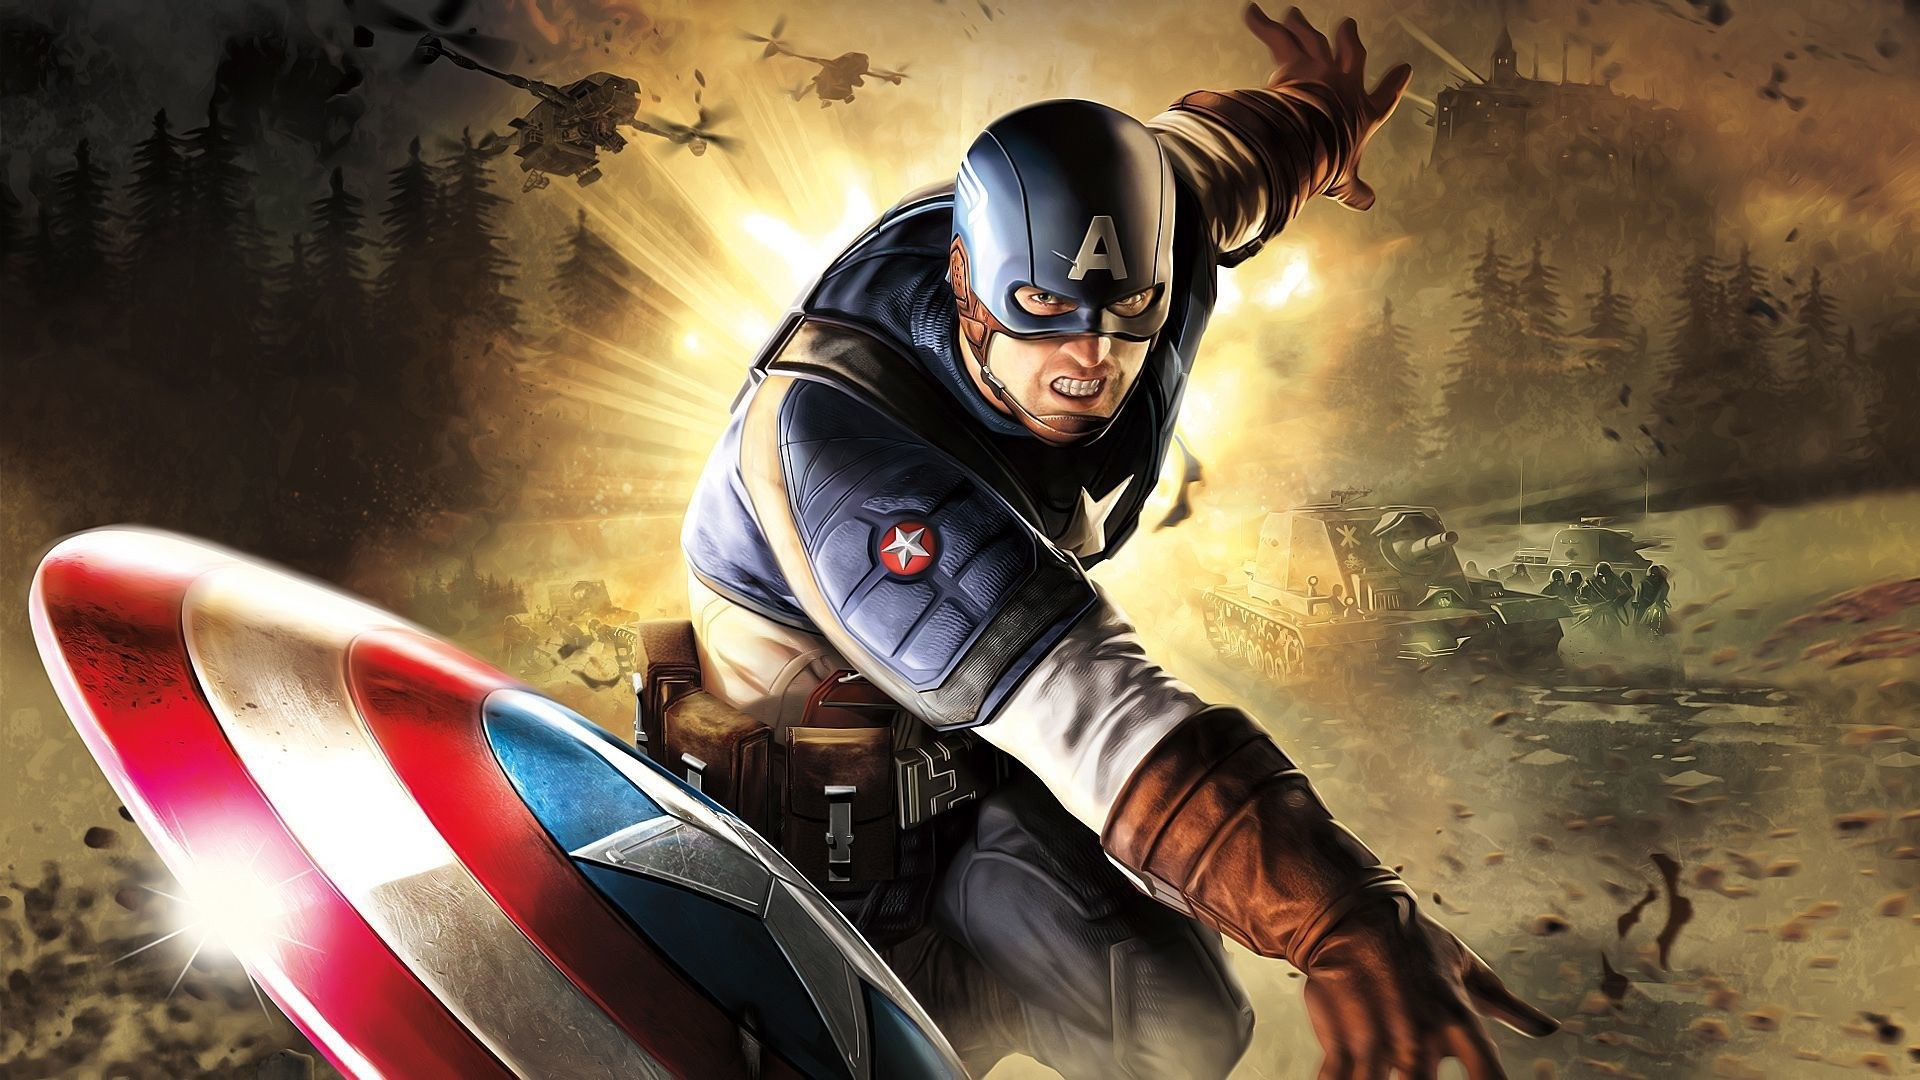 Captain America full hd 1080p wallpaper